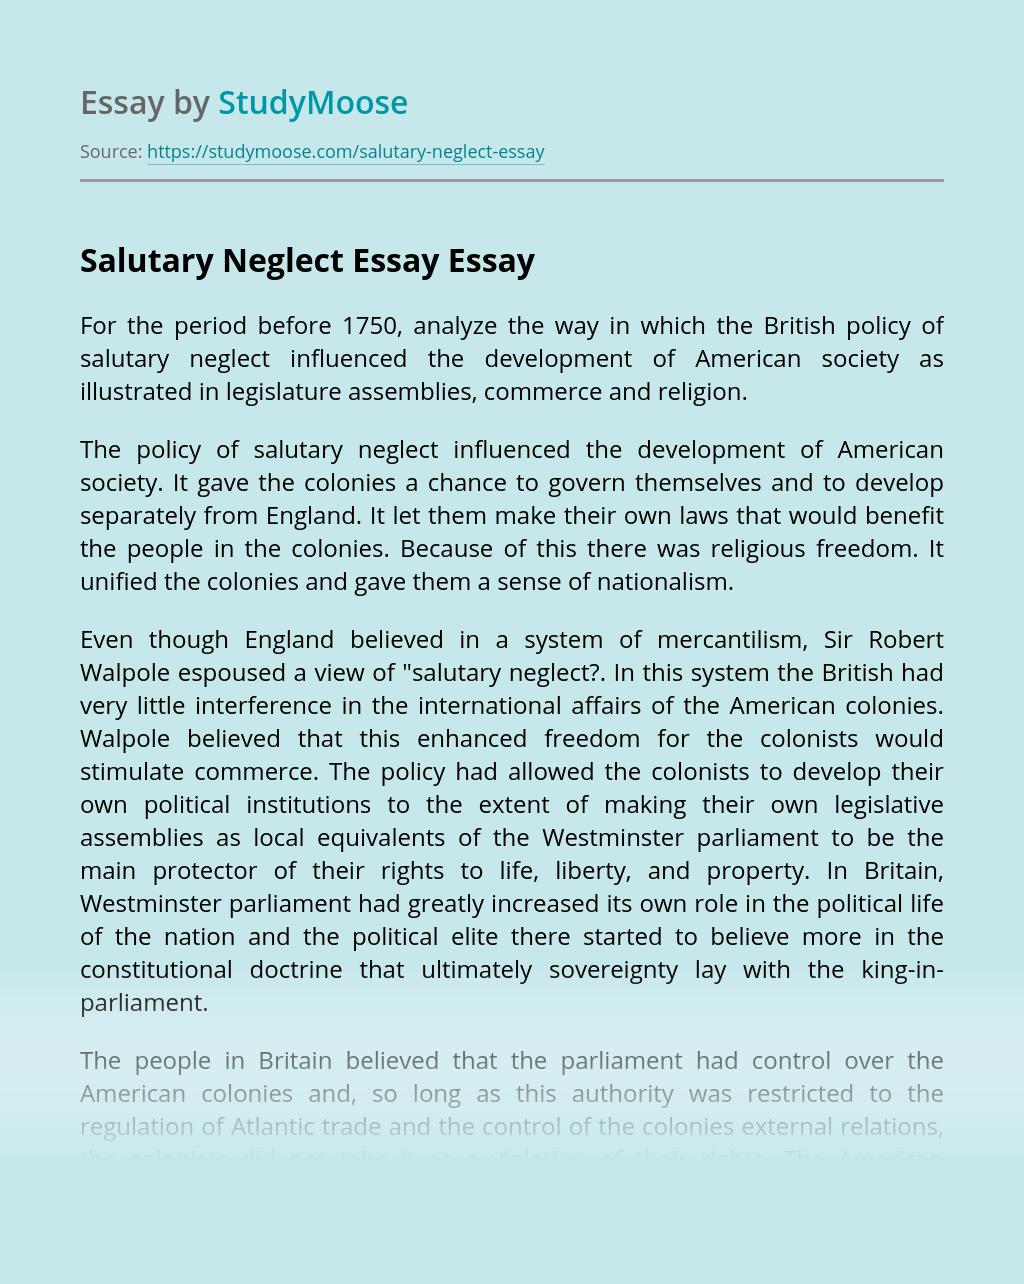 Salutary Neglect Essay